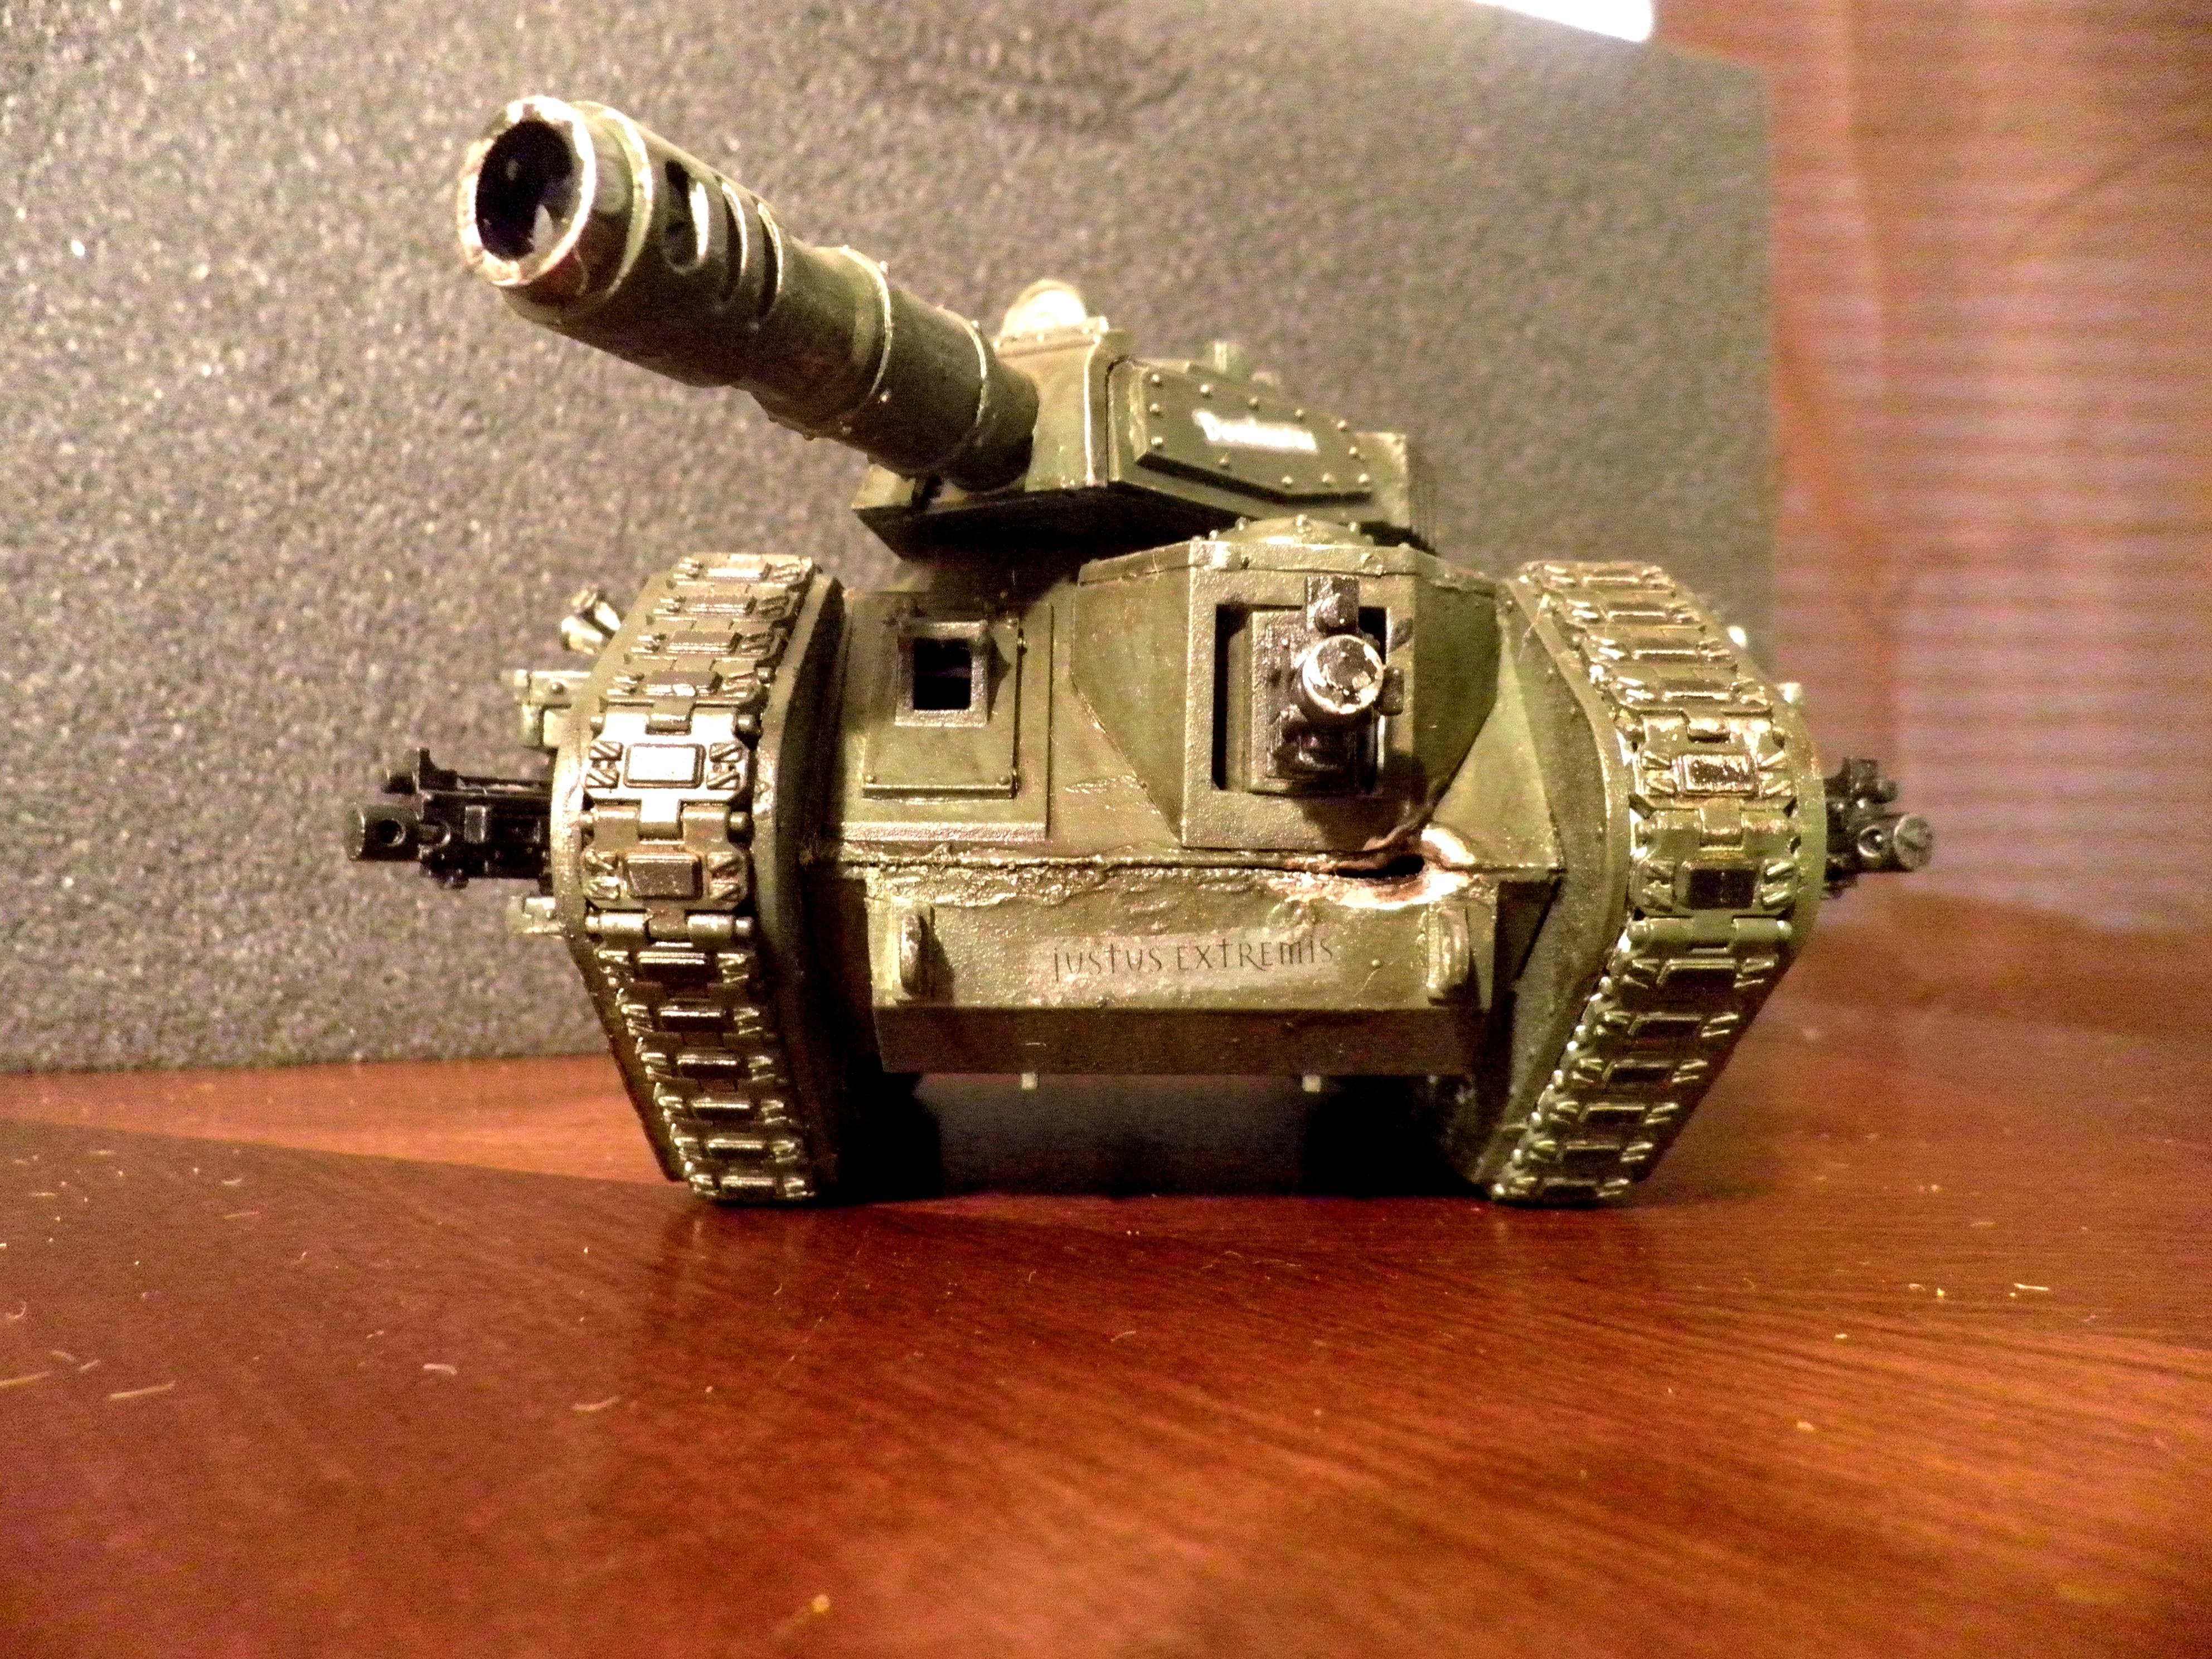 Astra Militarum, Cadians, Mech, Mechanized